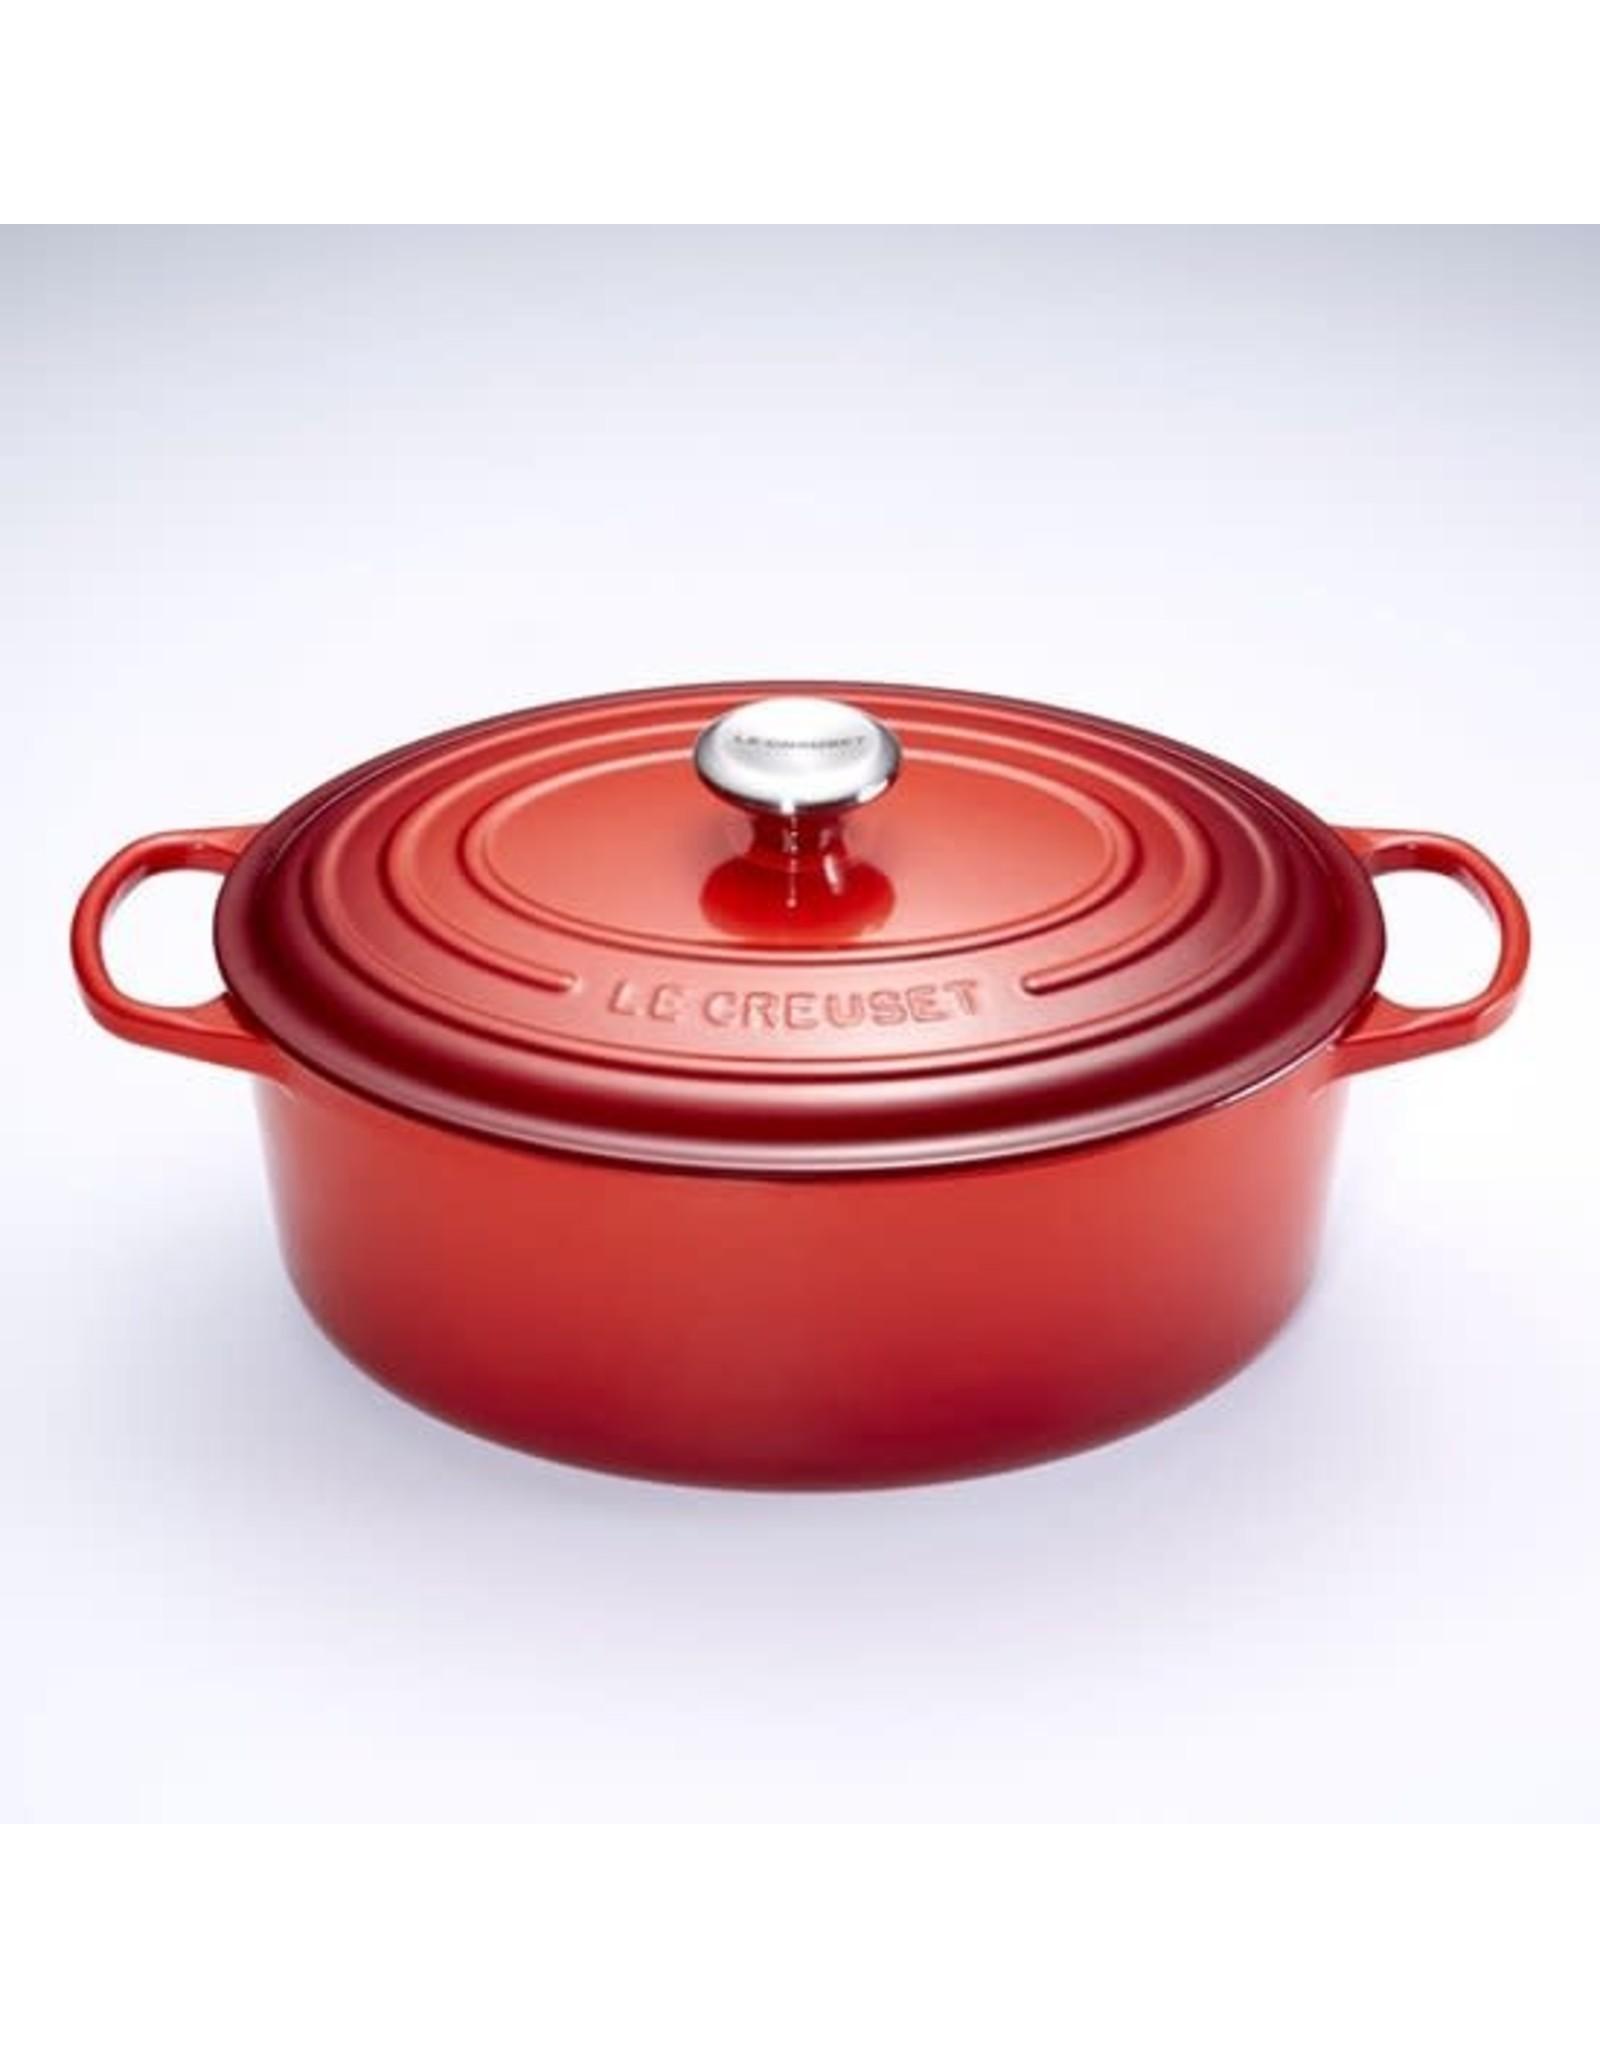 Le Creuset Le Creuset. Ovale Braadpan/Stoofpan - 7,5 liter - 33 cm - Kersenrood